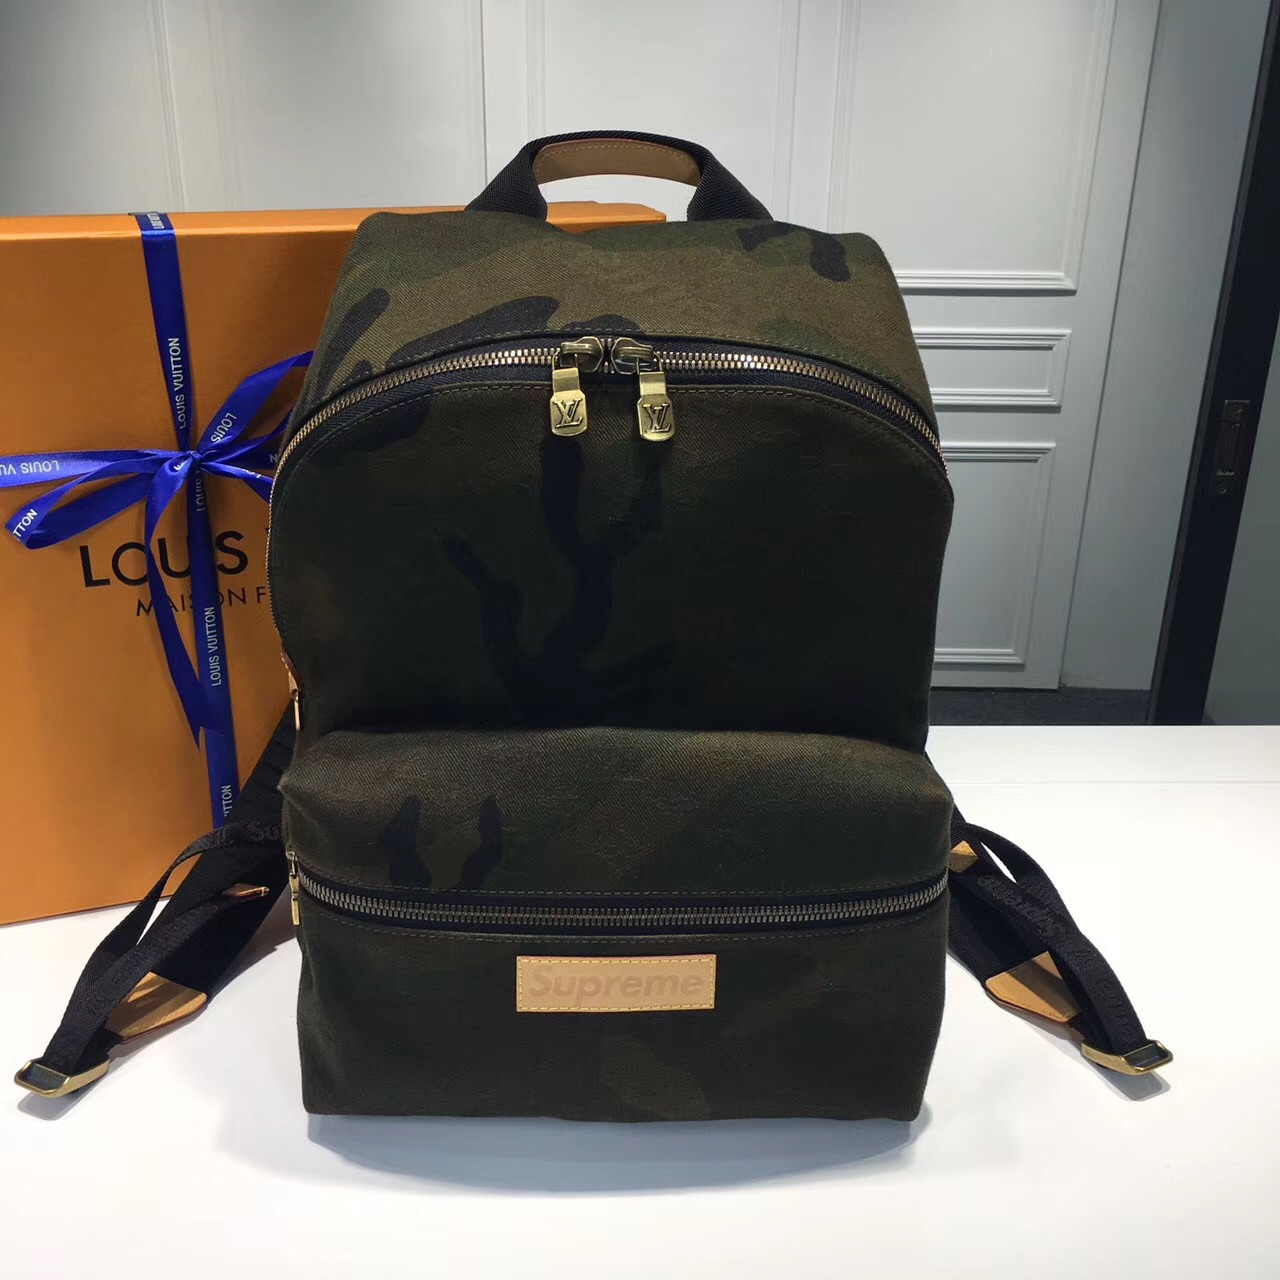 a5cdca186a0b Рюкзак Louis Vuitton X Supreme городской камуфляж, цена 9 800 грн ...